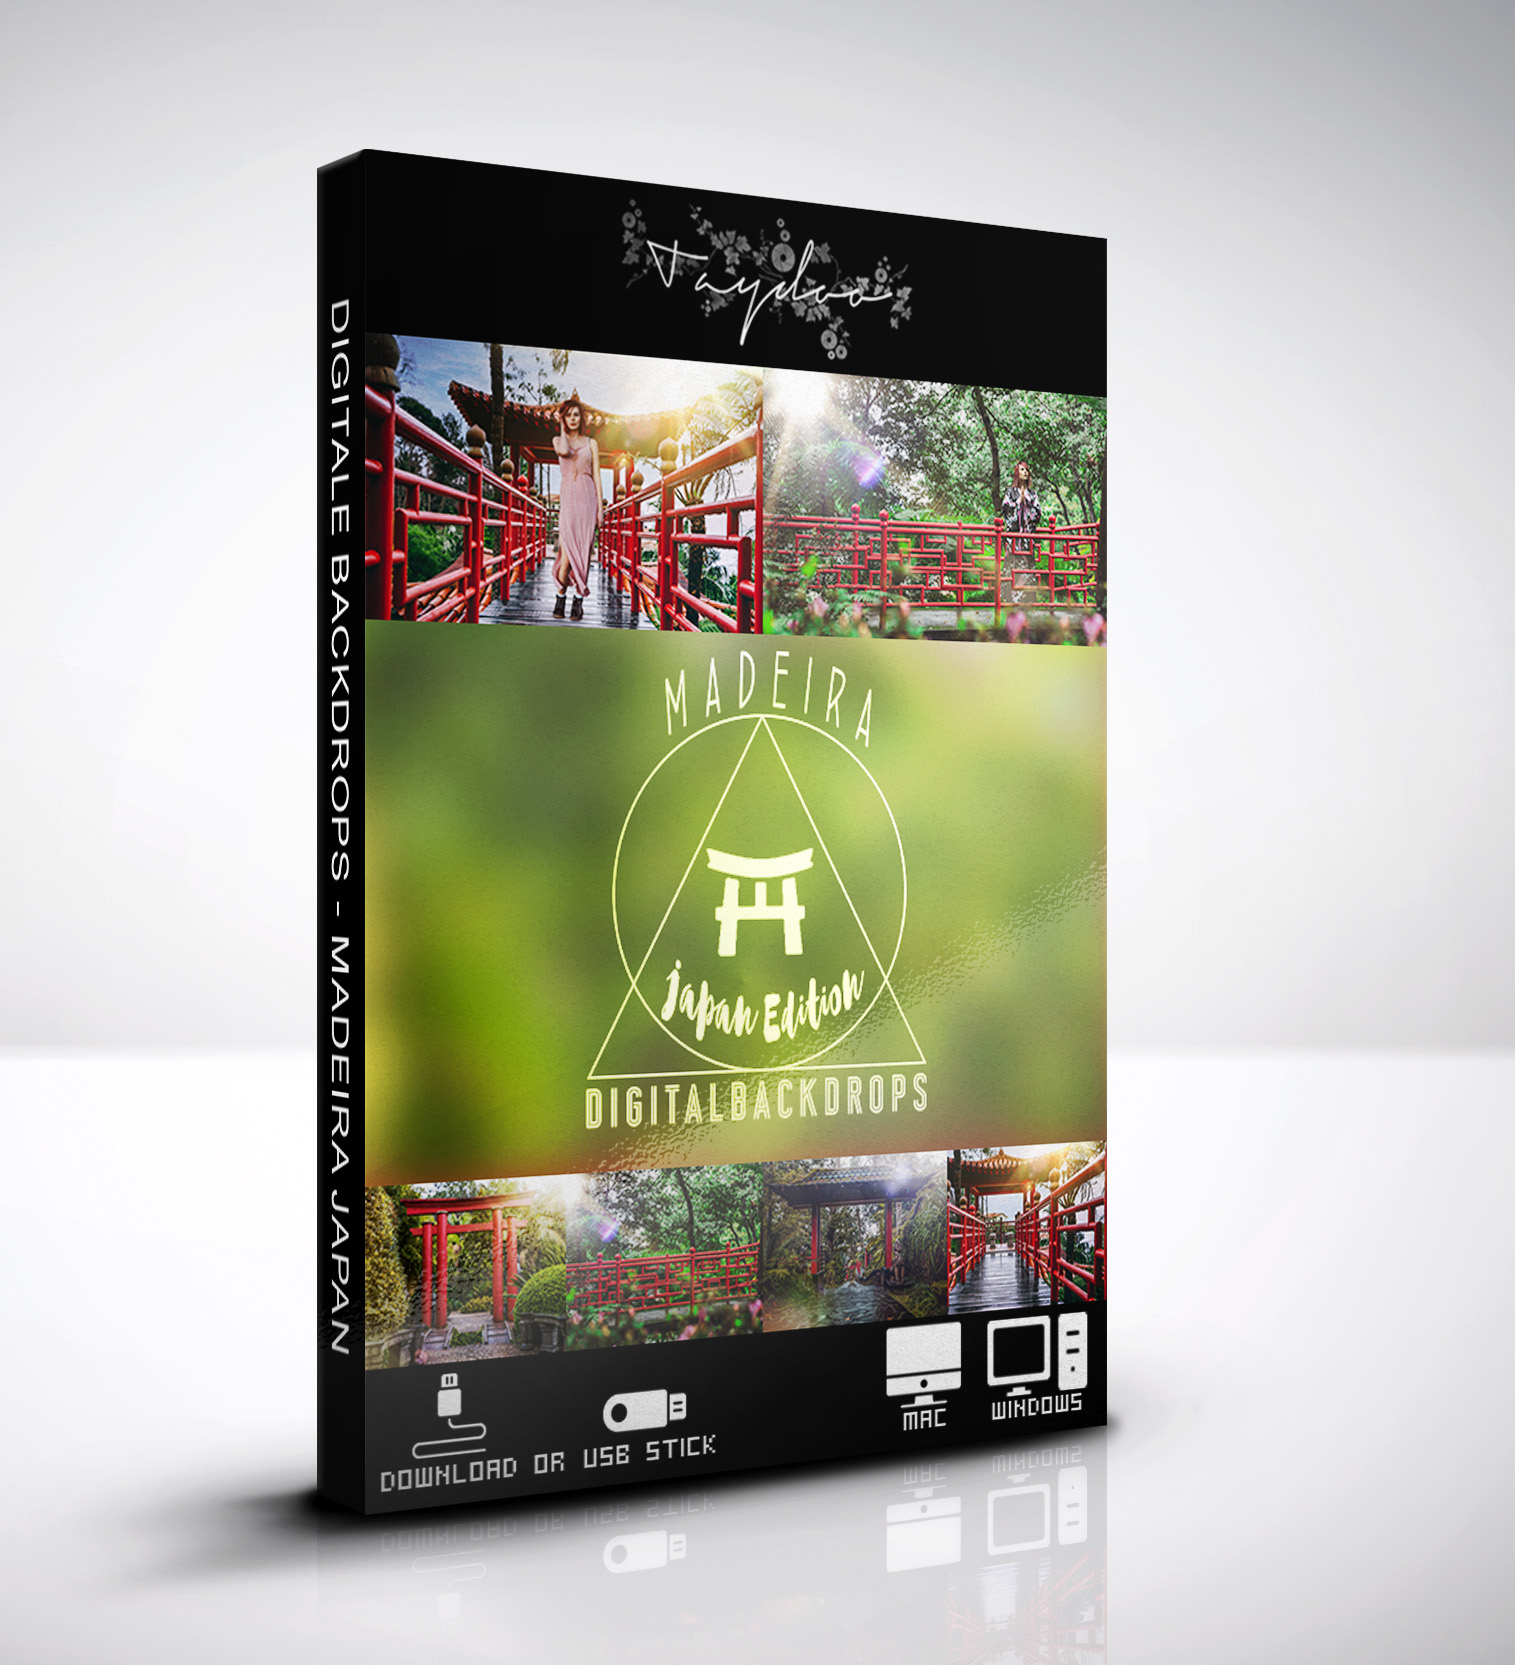 produktbox-backdrops-madeira-japan